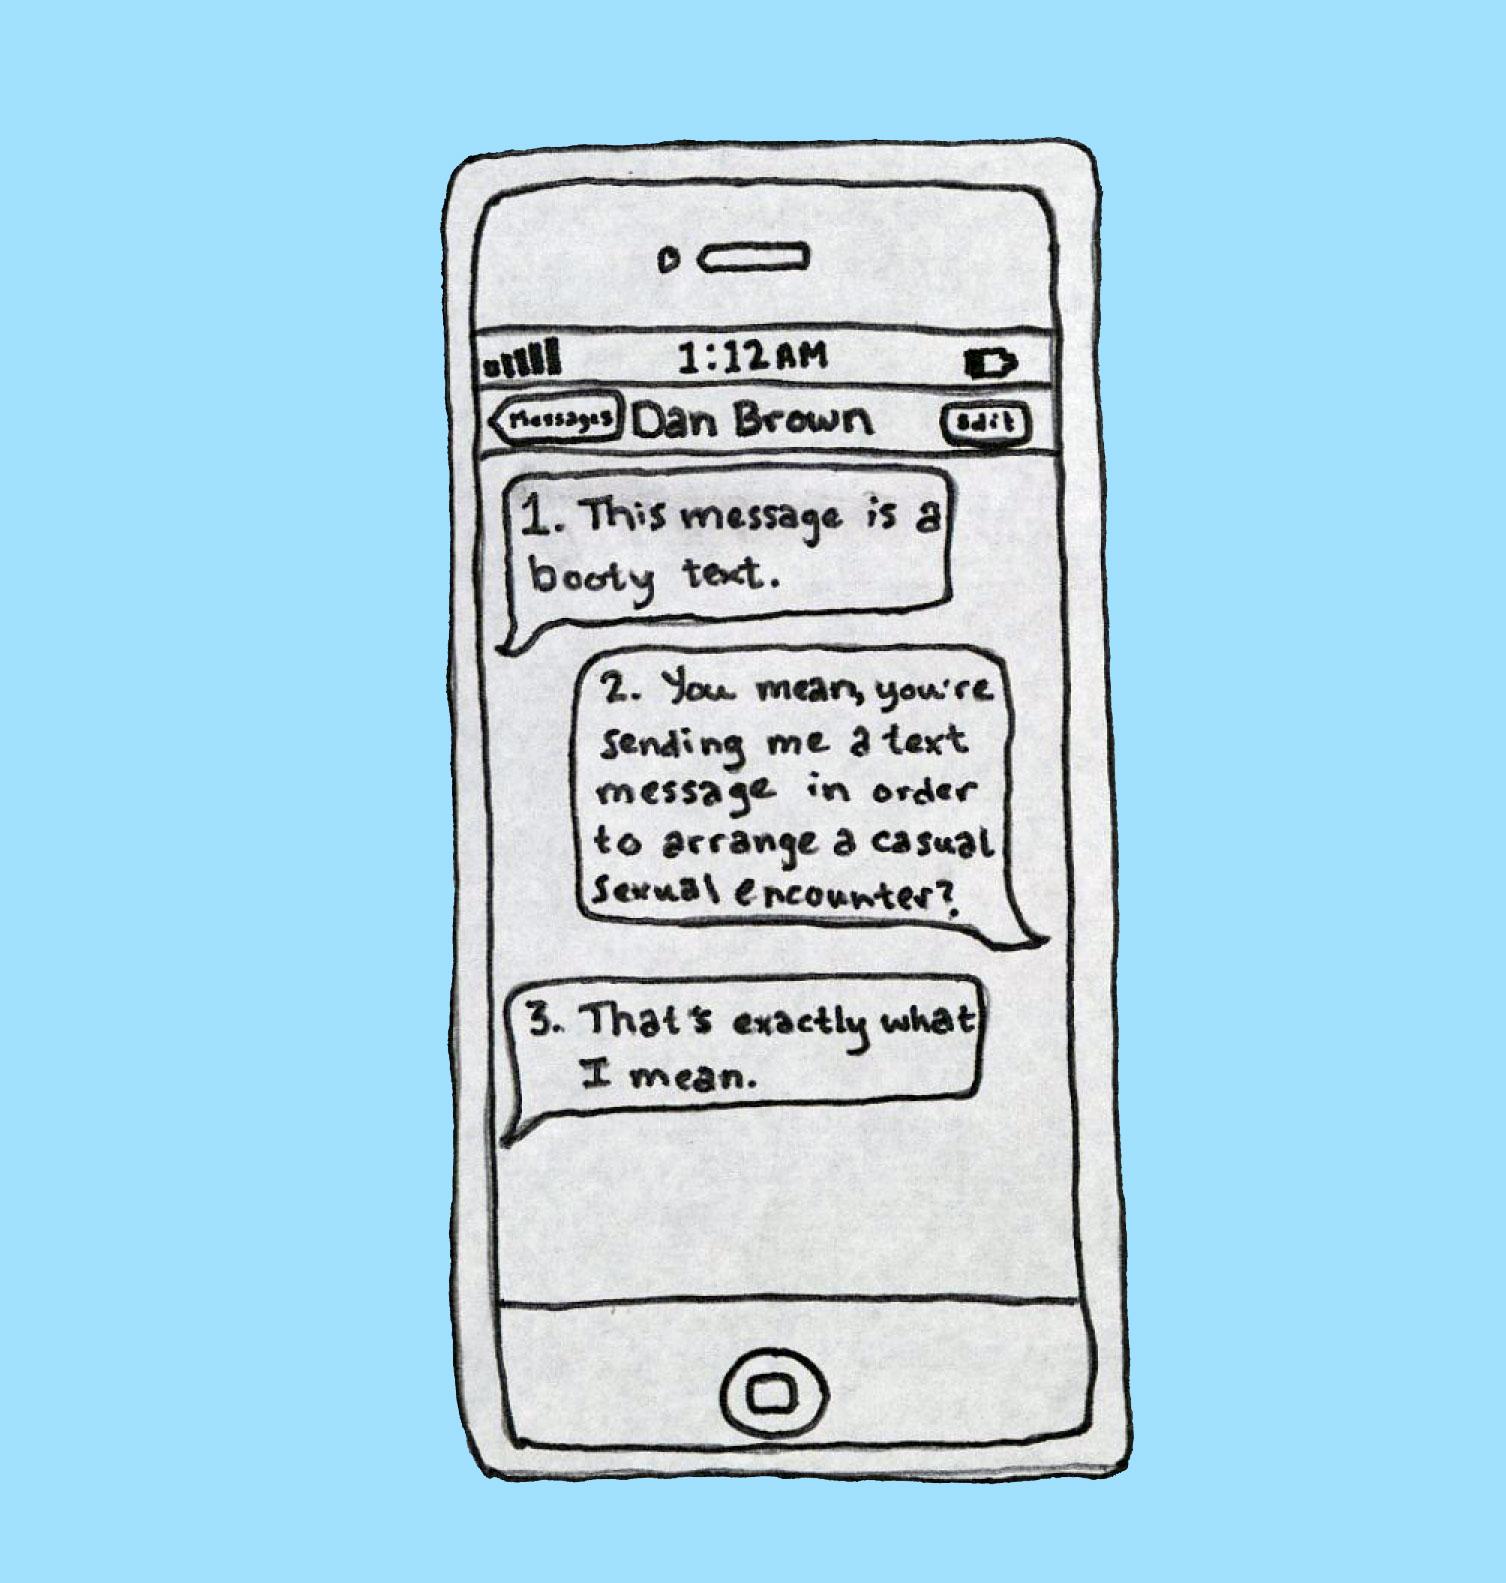 gaynor_danbrown_texts